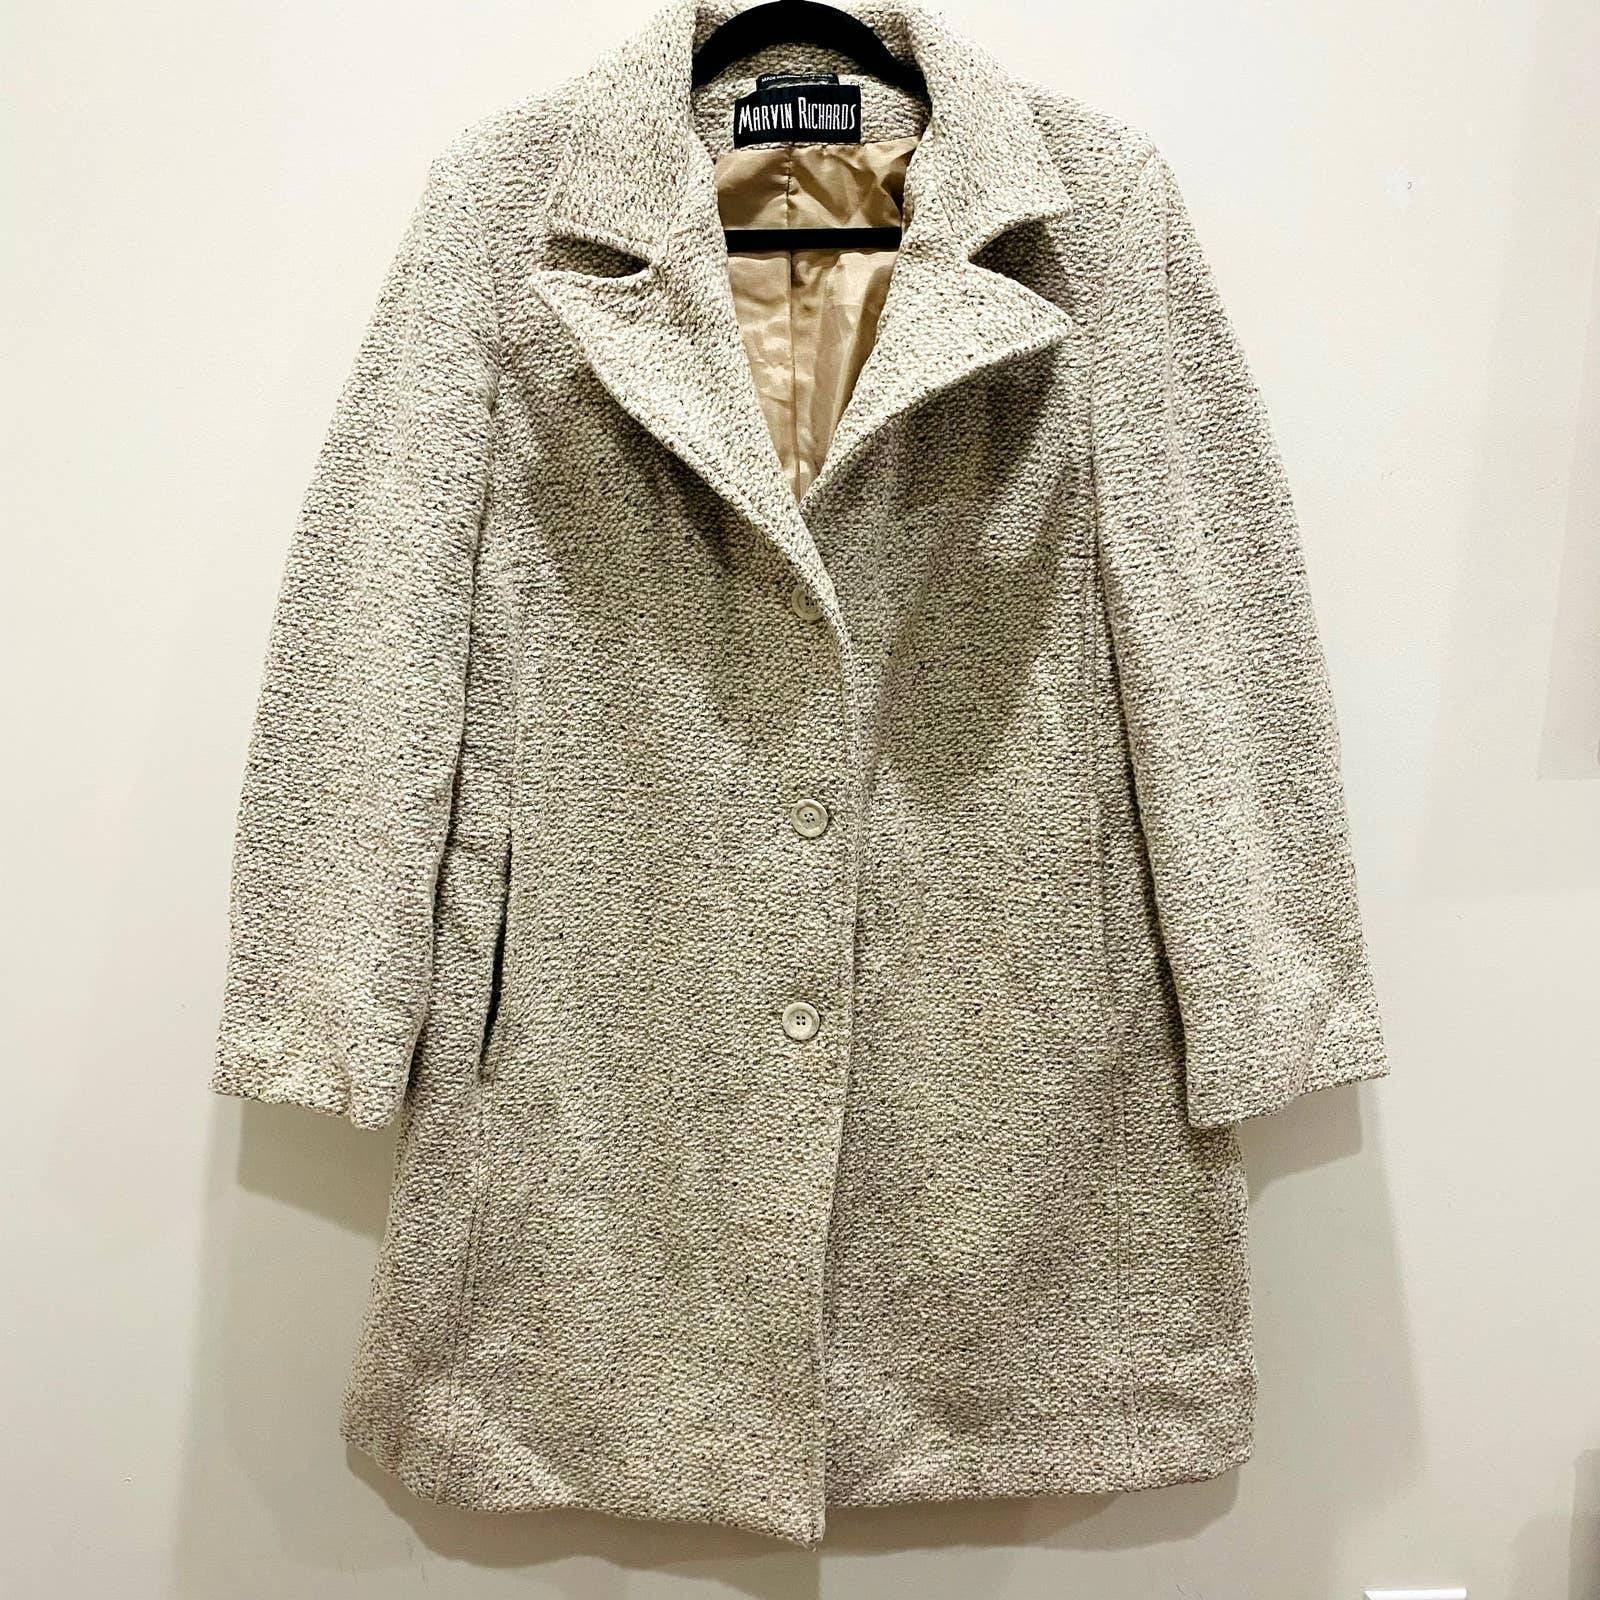 Vintage Marvin Richards Wool Overcoat